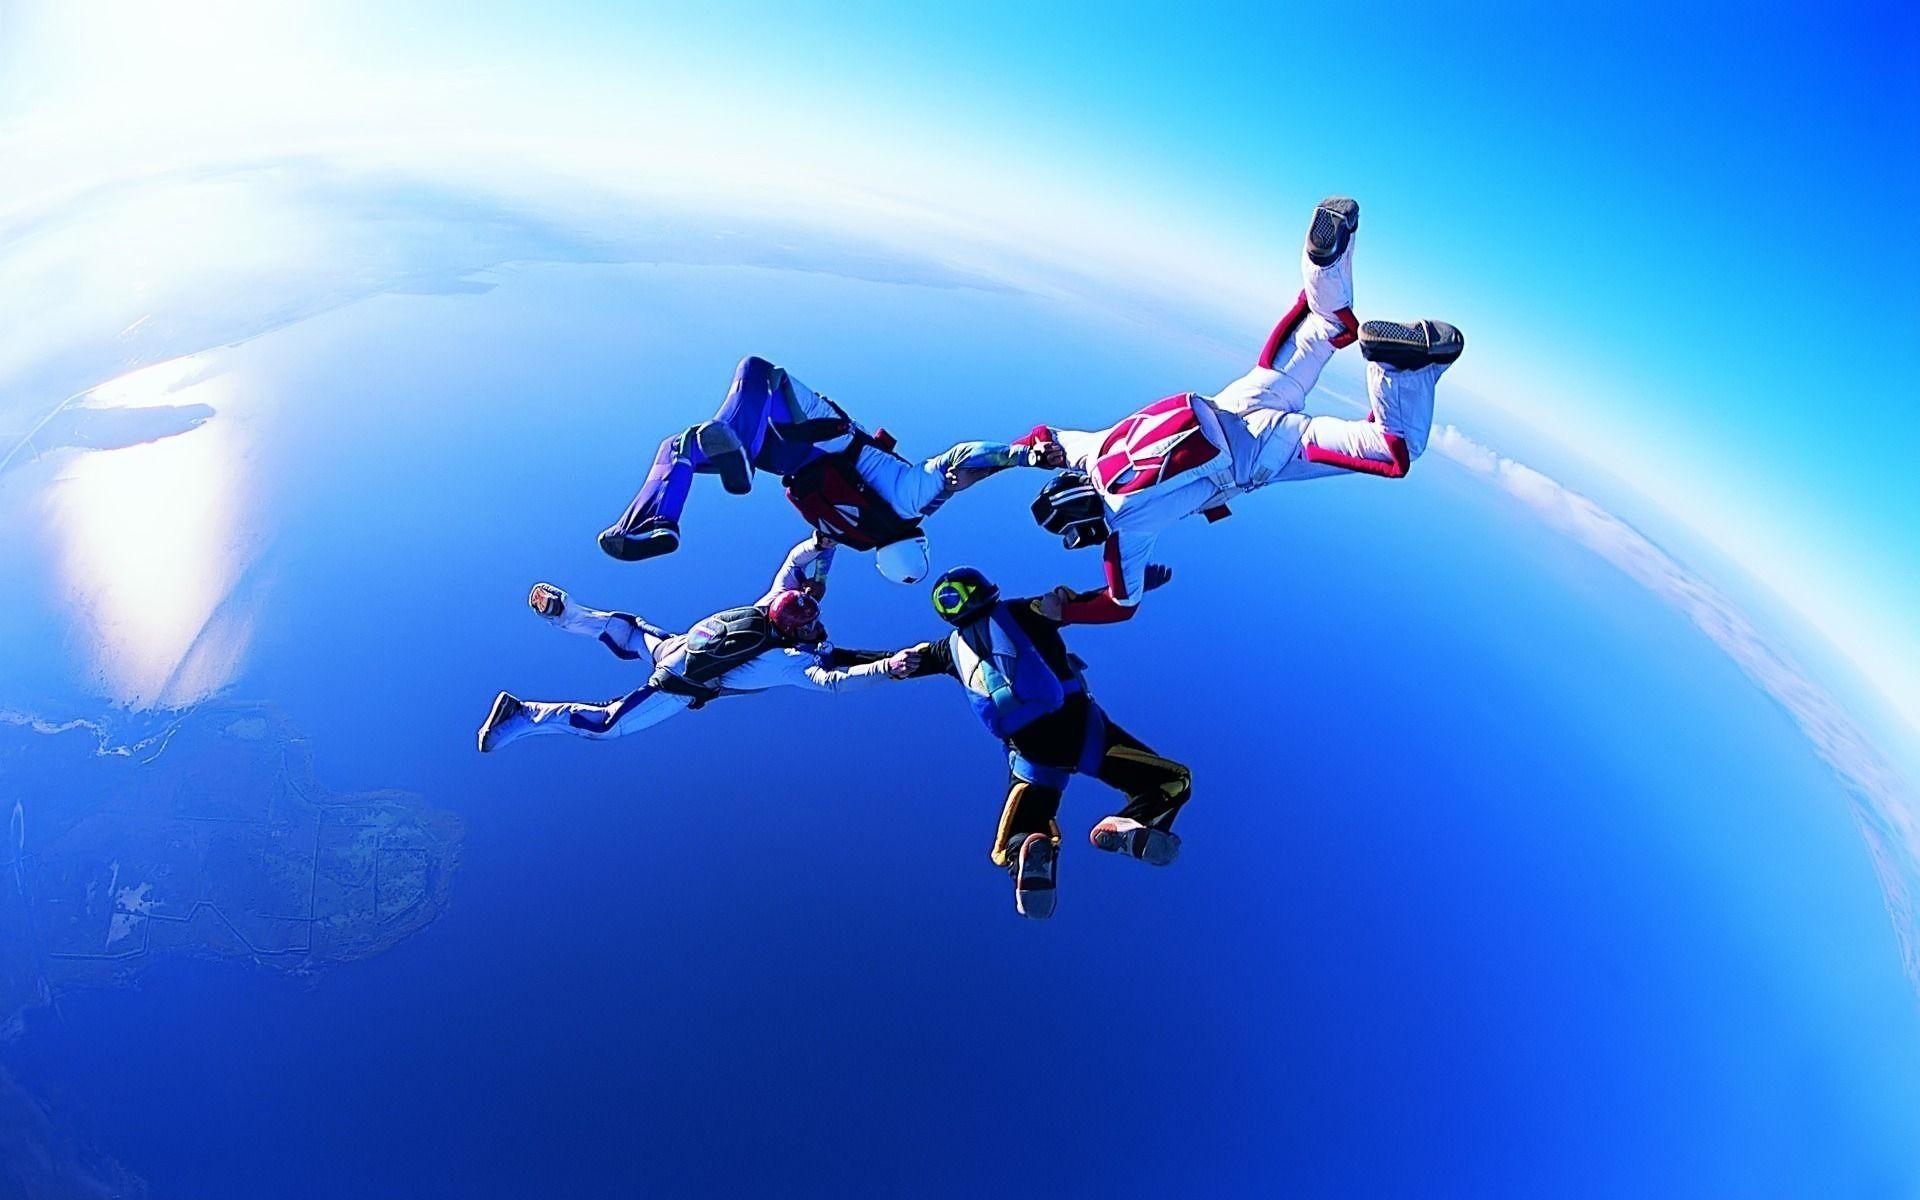 Skydive HD wallpaper HD Adventure, Sports wallpapers